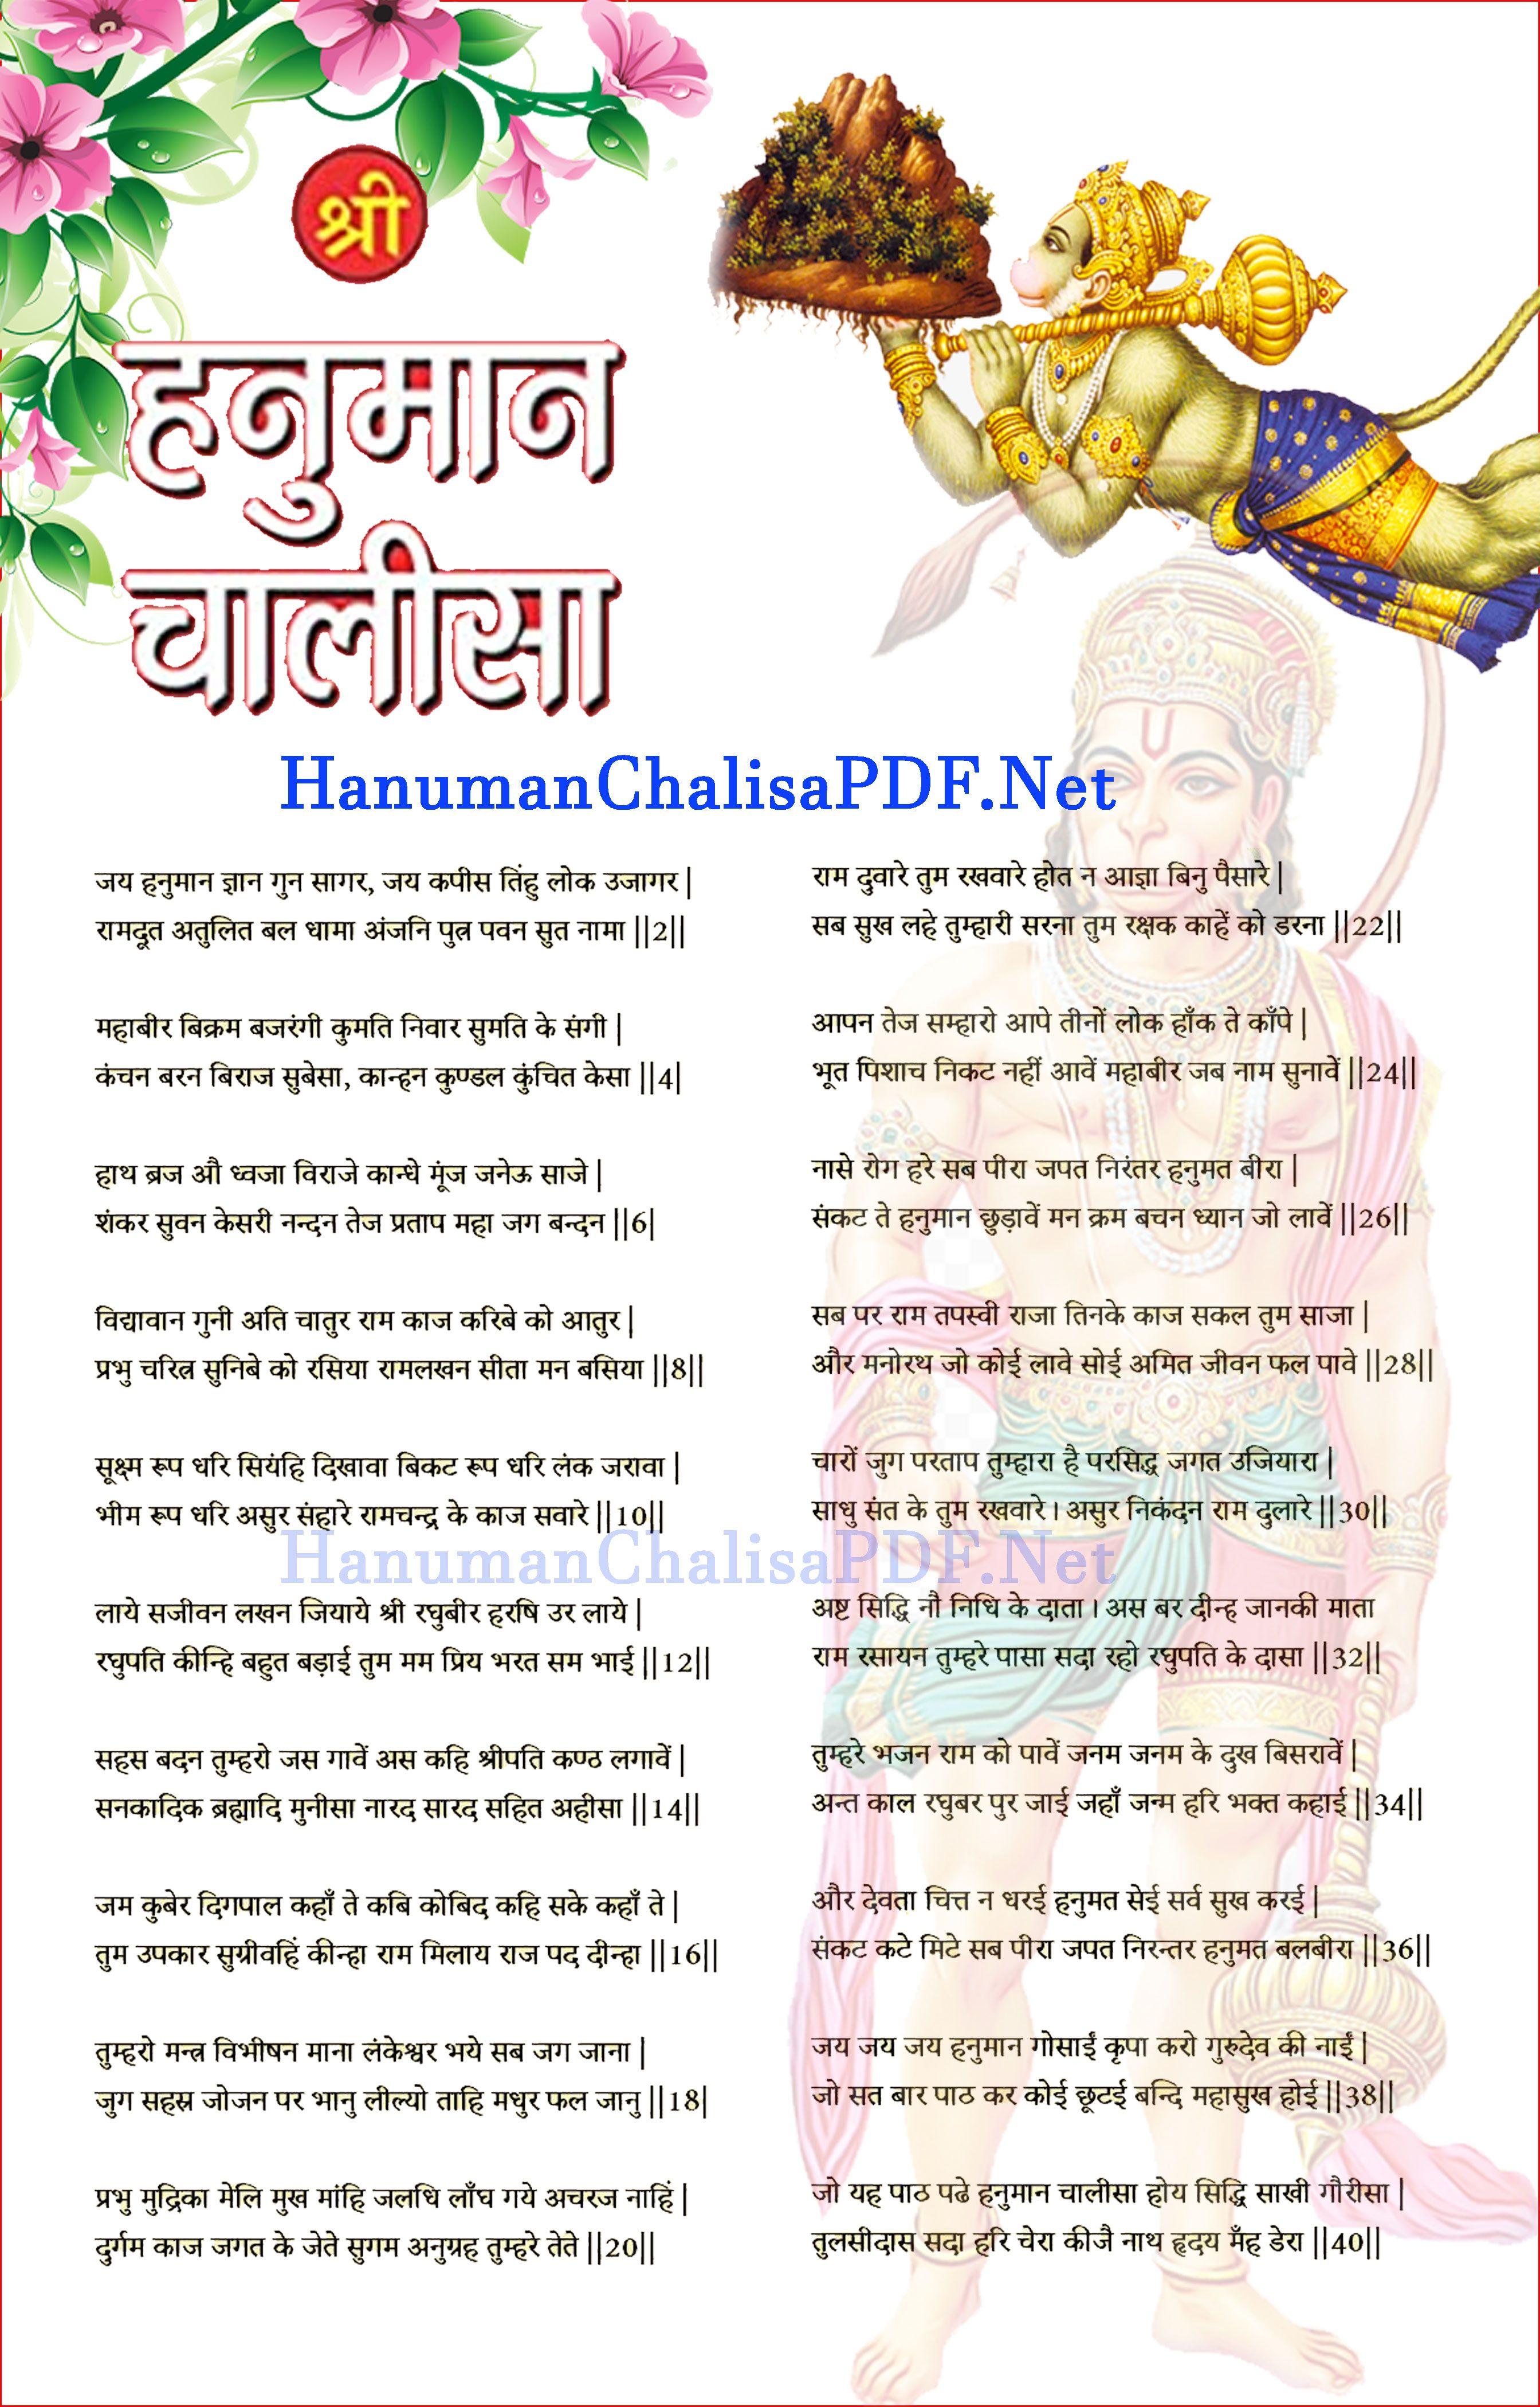 Hanuman Chalisa Pdf Hindi Lyrics Image Hanuman Chalisa Pdf Hanuman Chalisa Hanuman